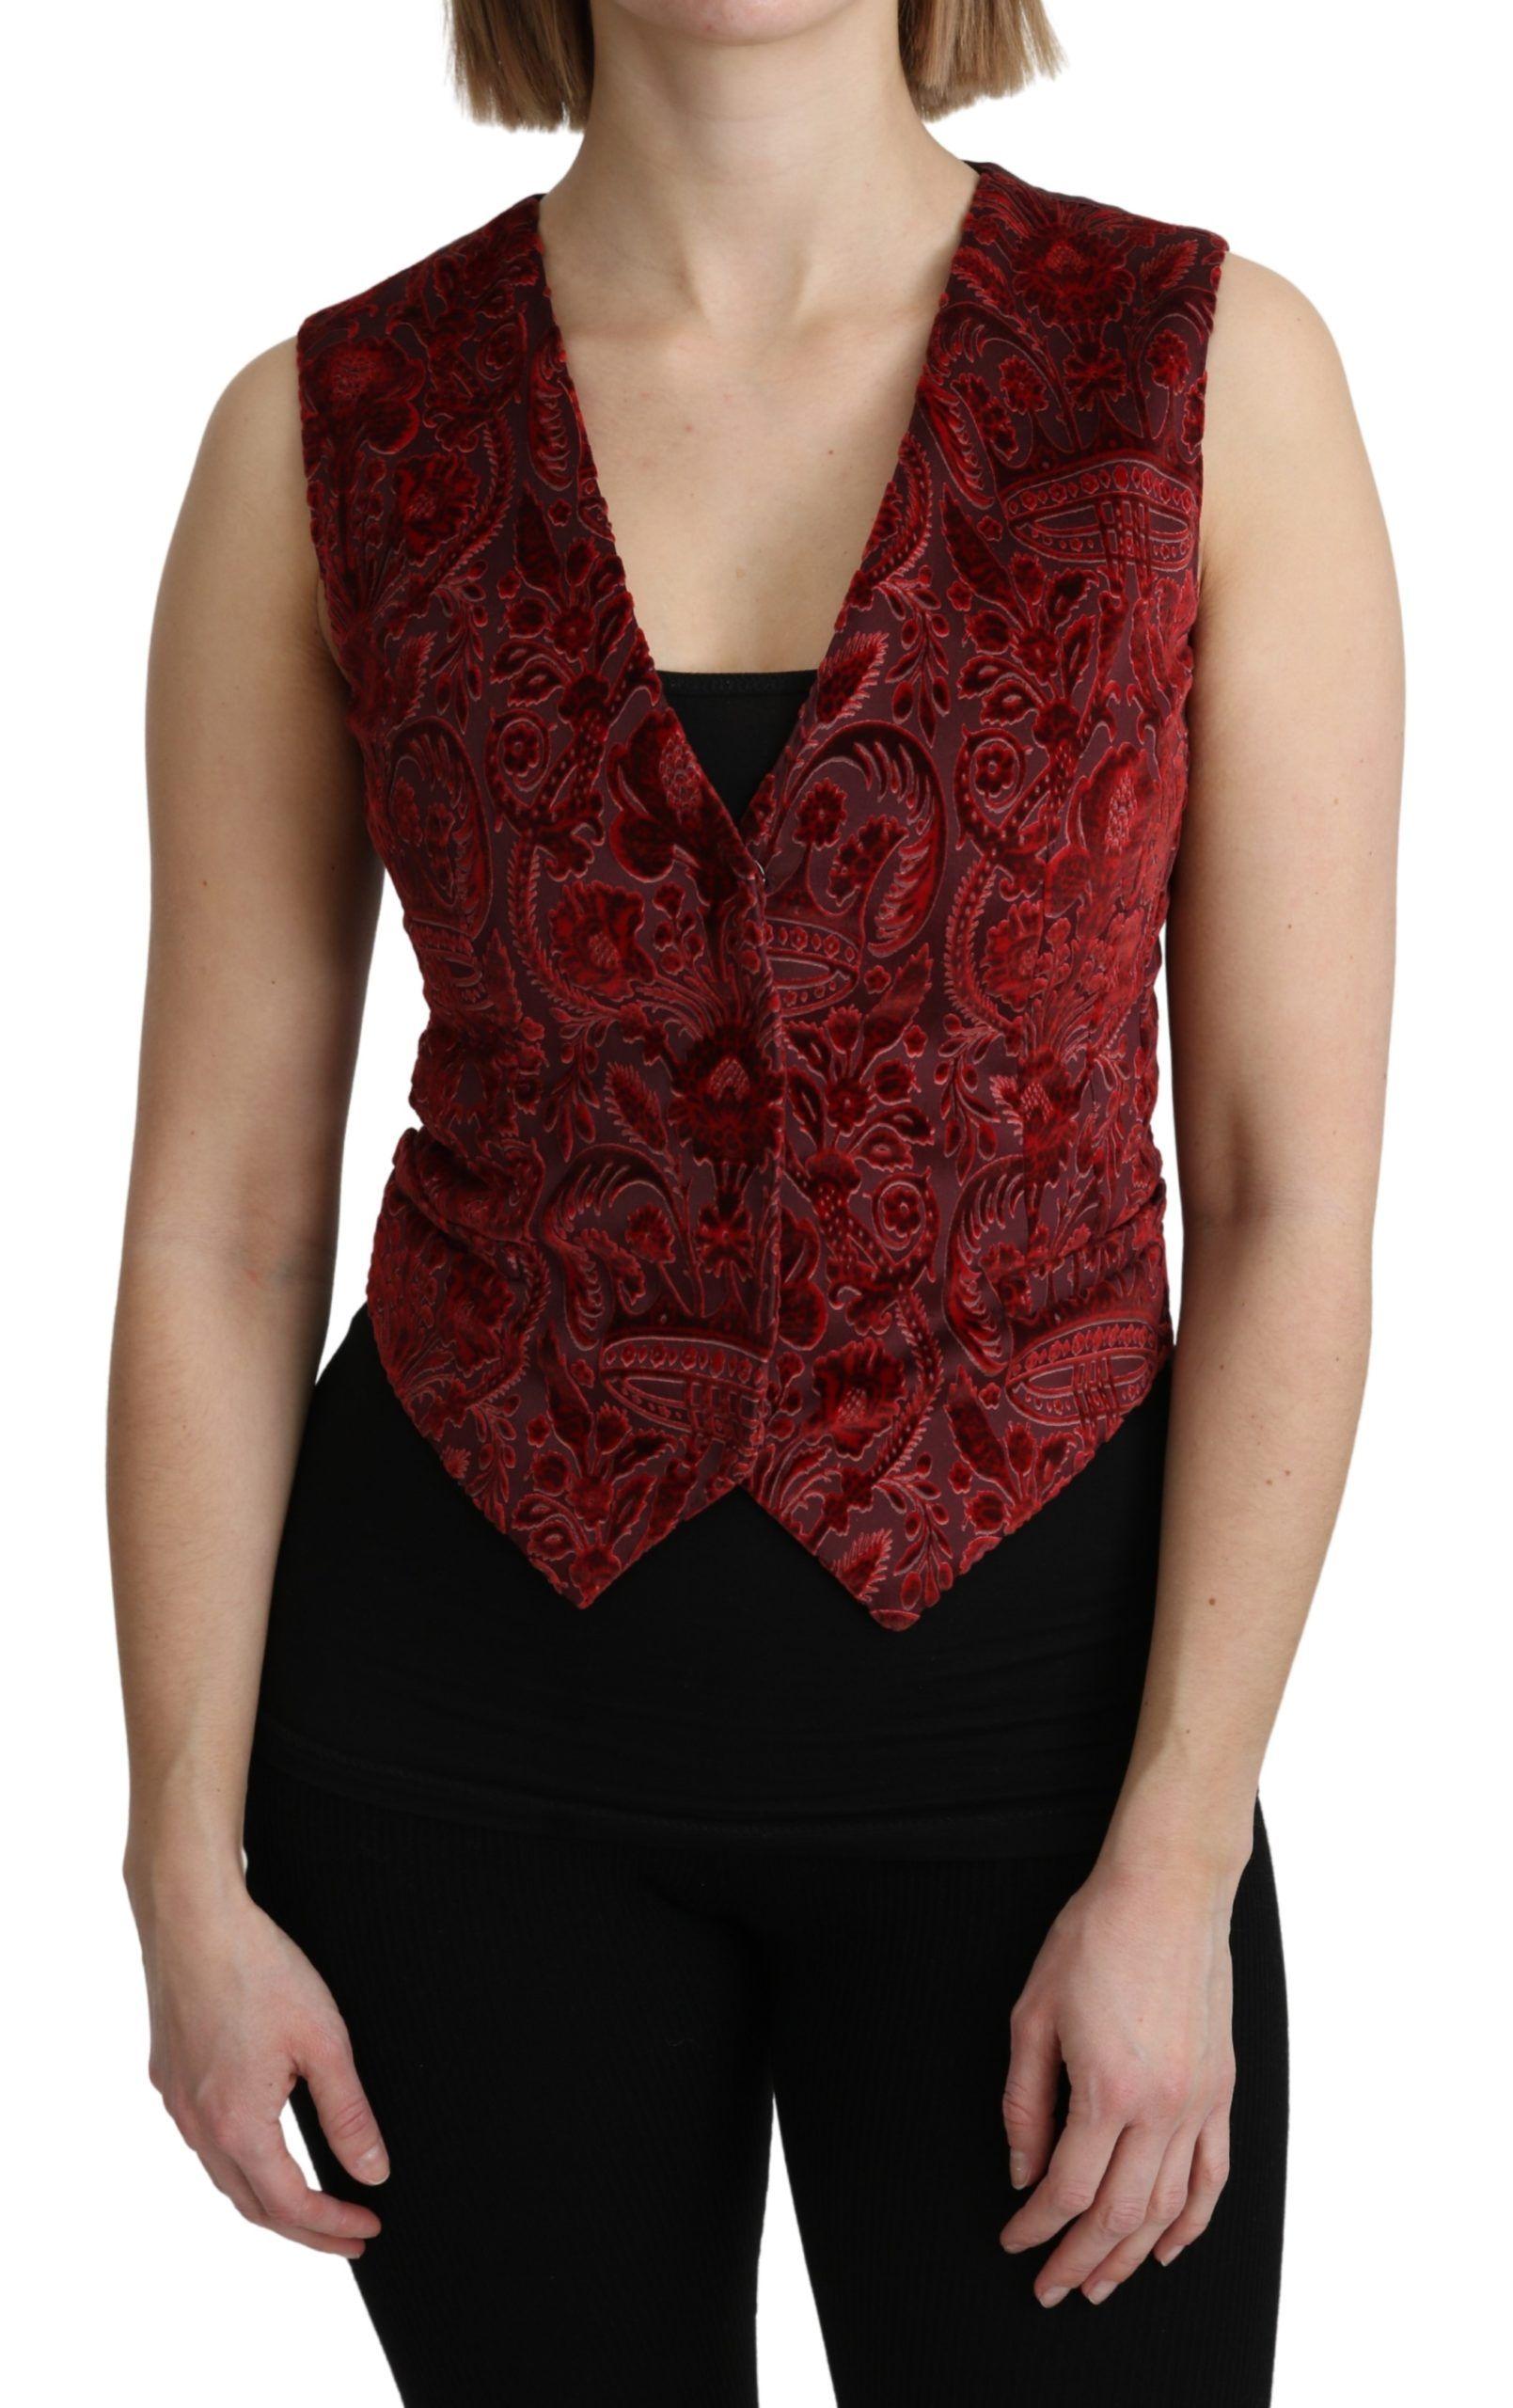 Dolce & Gabbana Bordeaux Brocade Waistcoat Vest Cotton Top